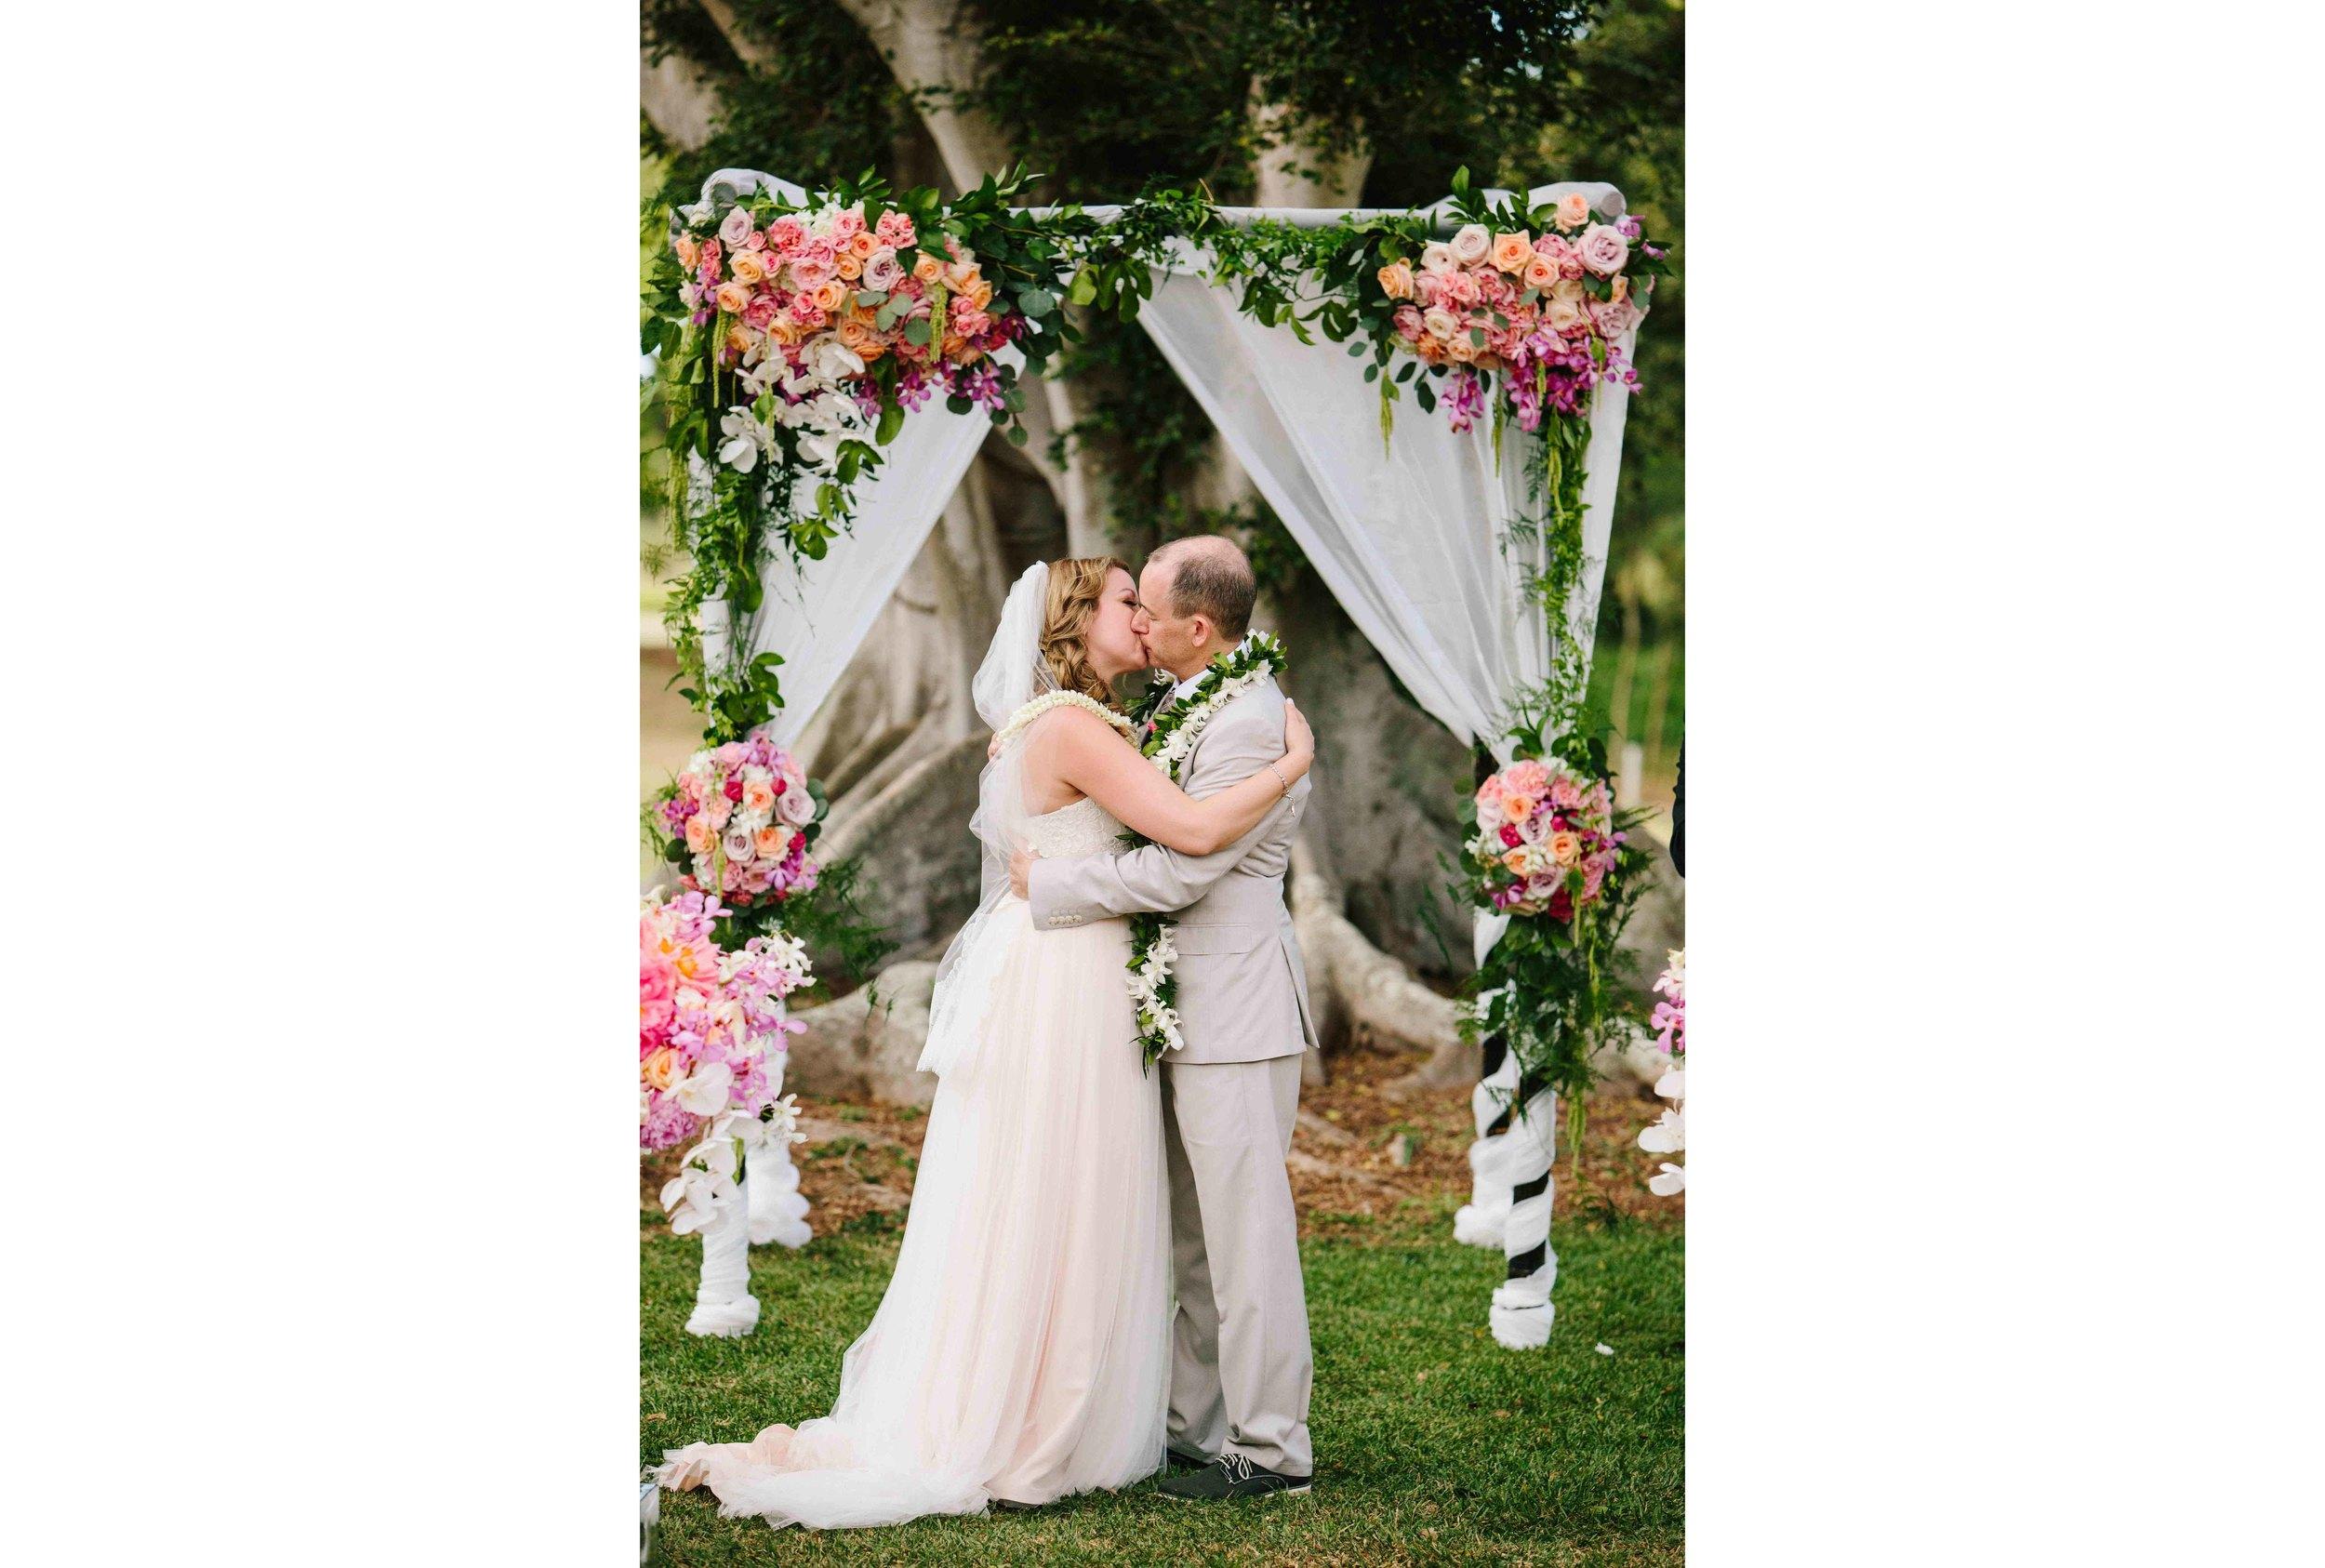 Kiss Beneath The Wedding Arch